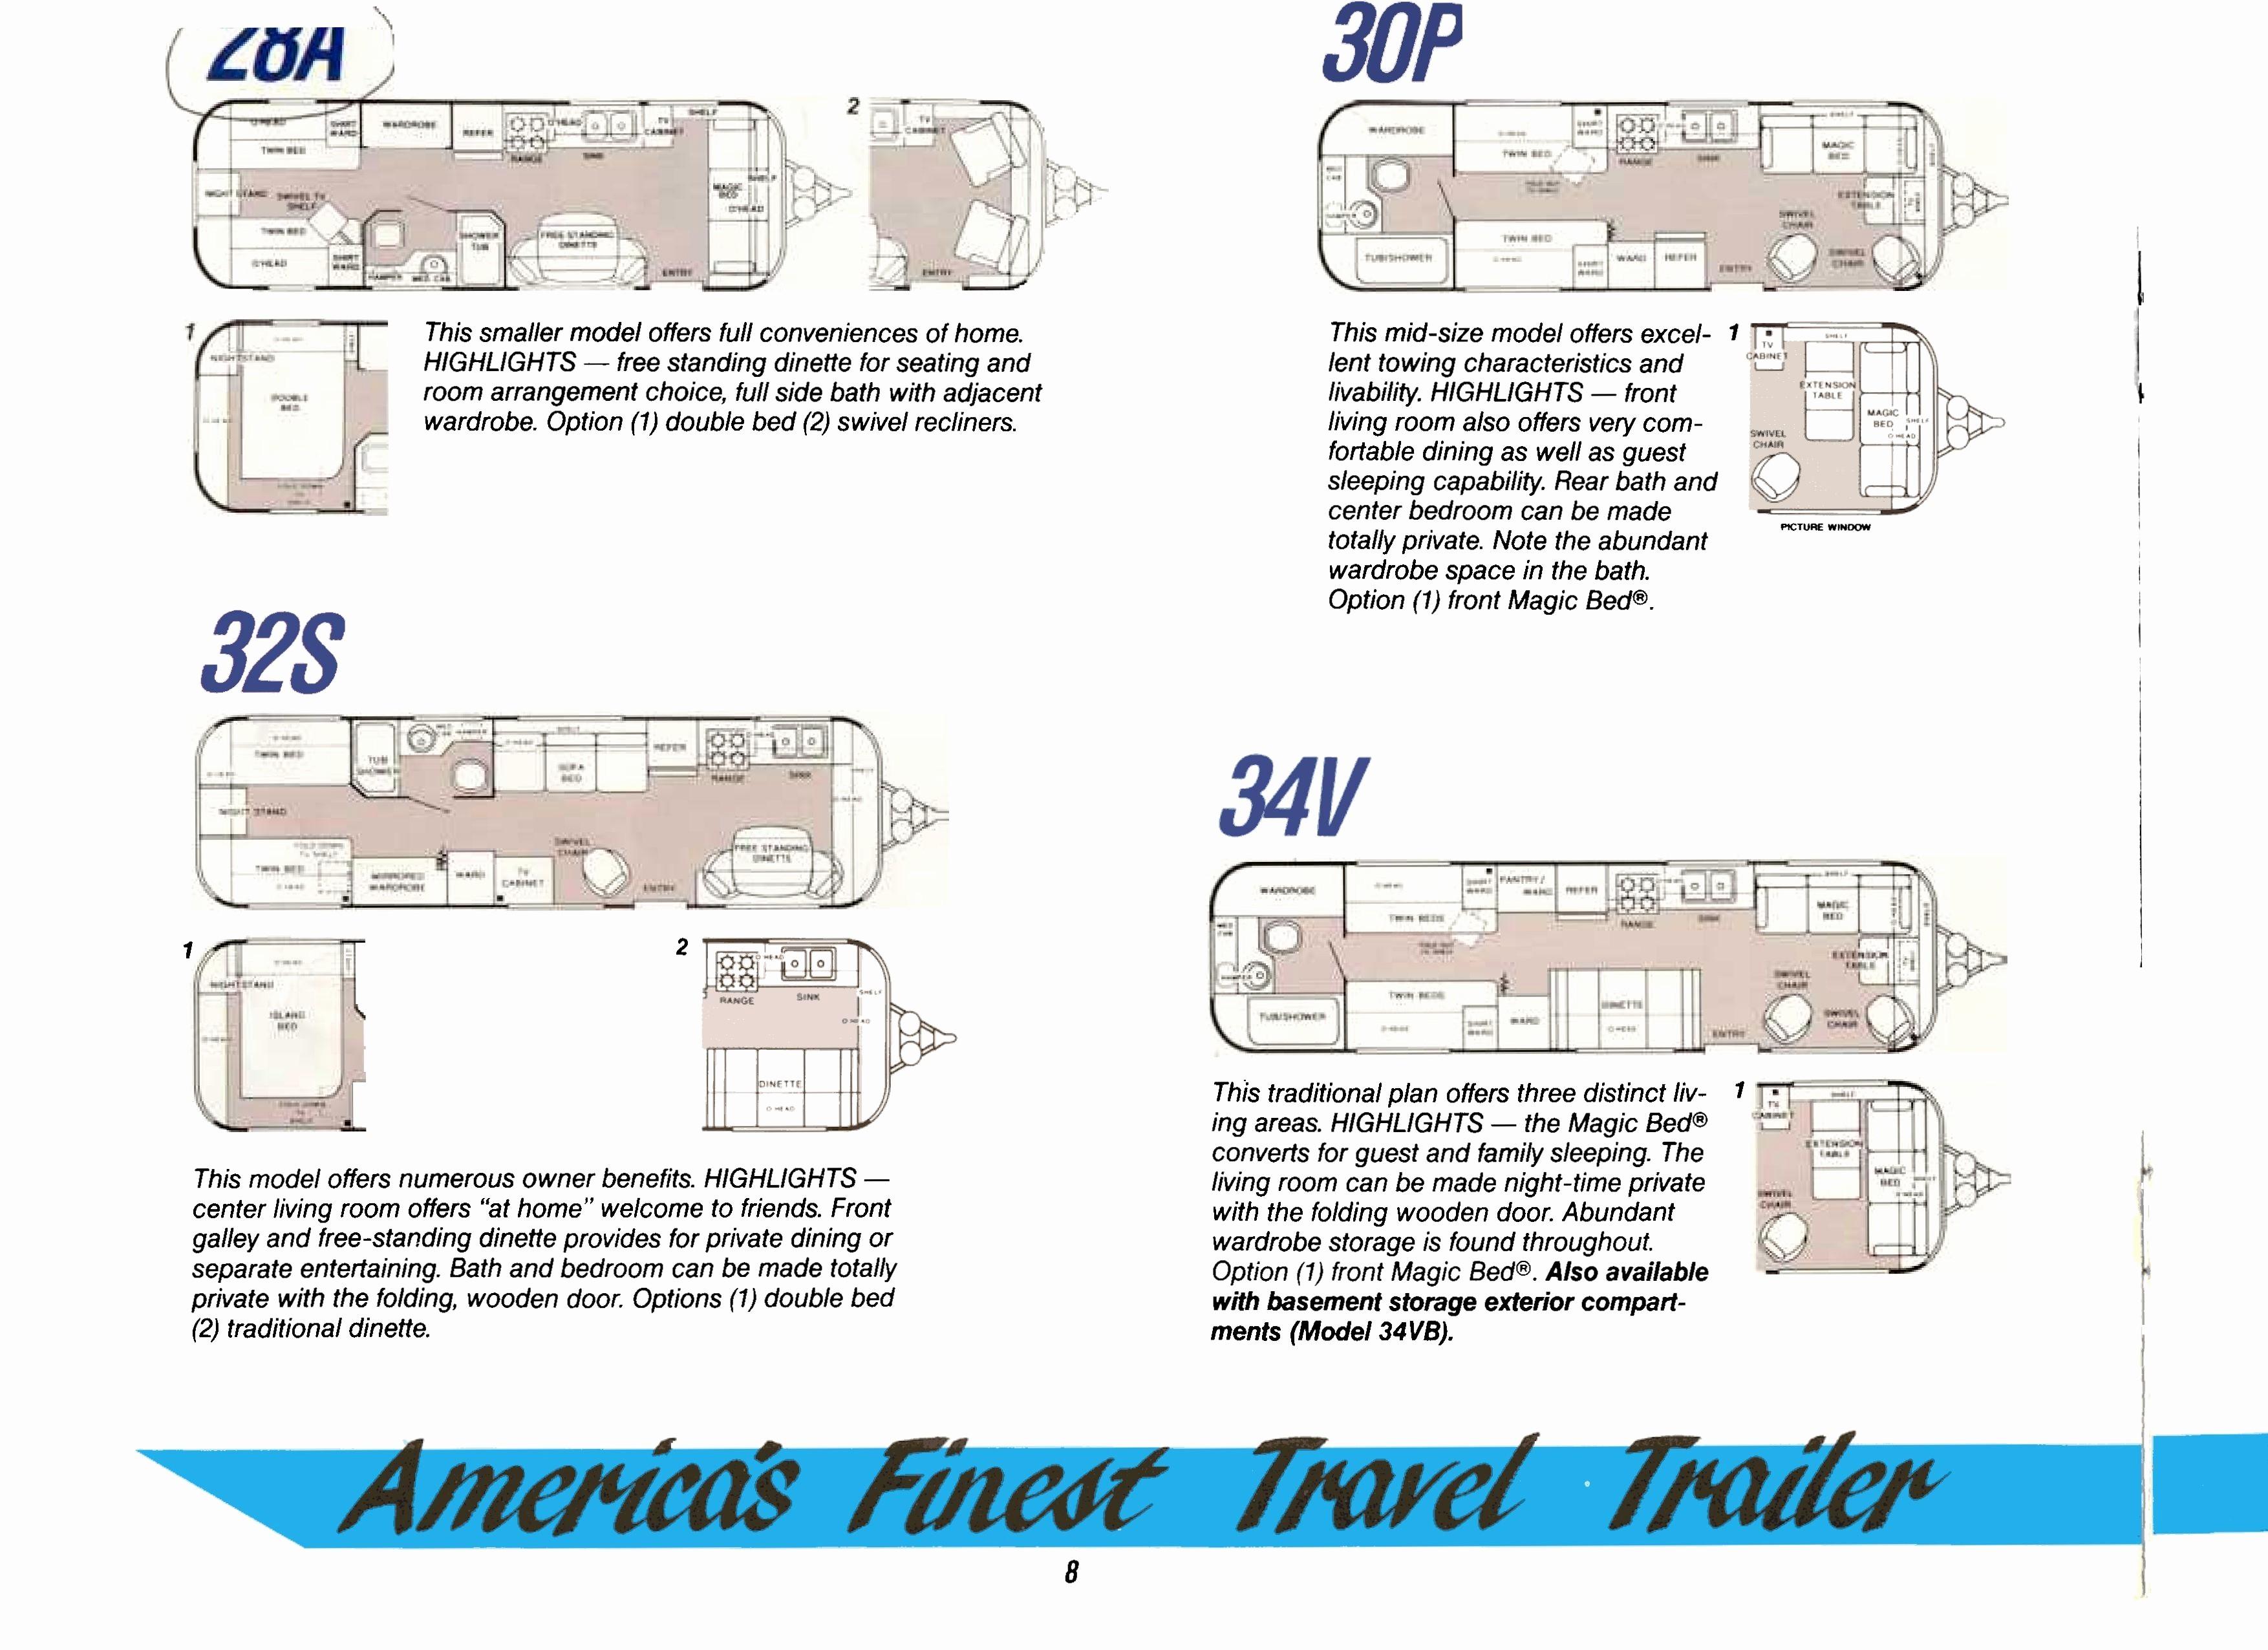 Ah 7085 Wiring Instructions Suntrust Bank Wiring Diagram Manual Guide